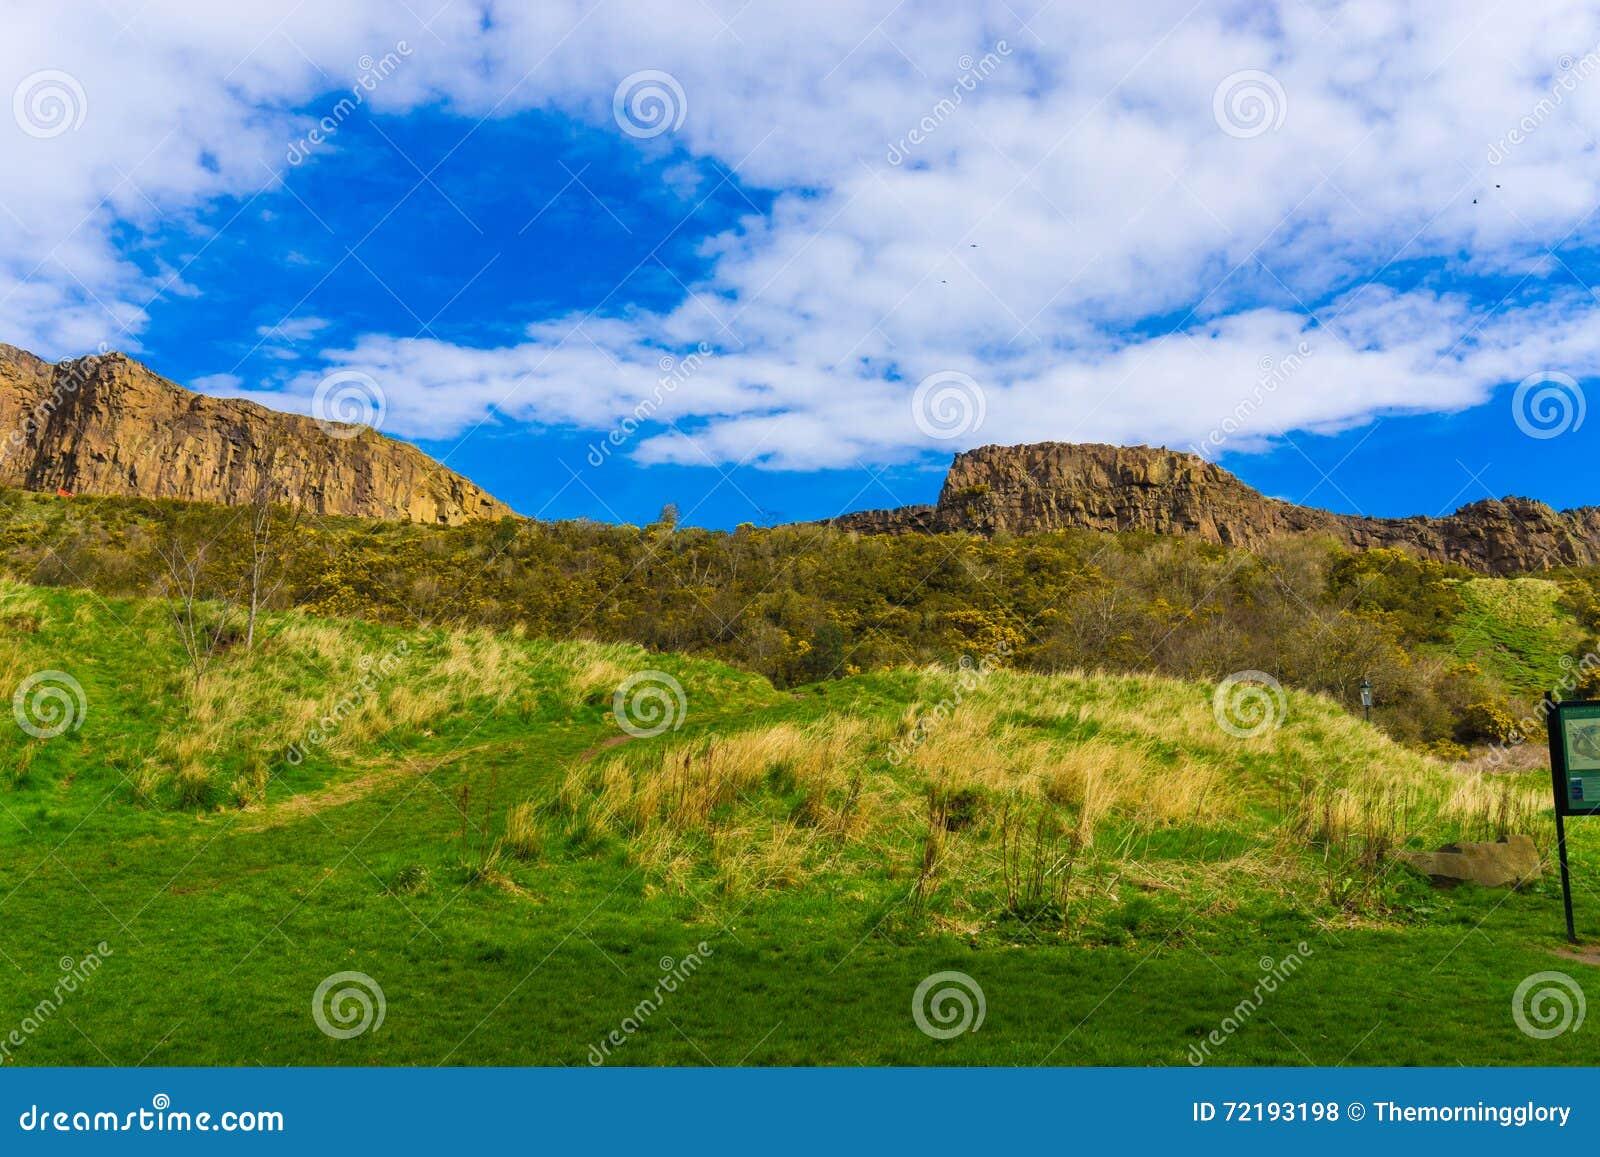 Horizonte de la hierba verde de la montaña de Edimburgo